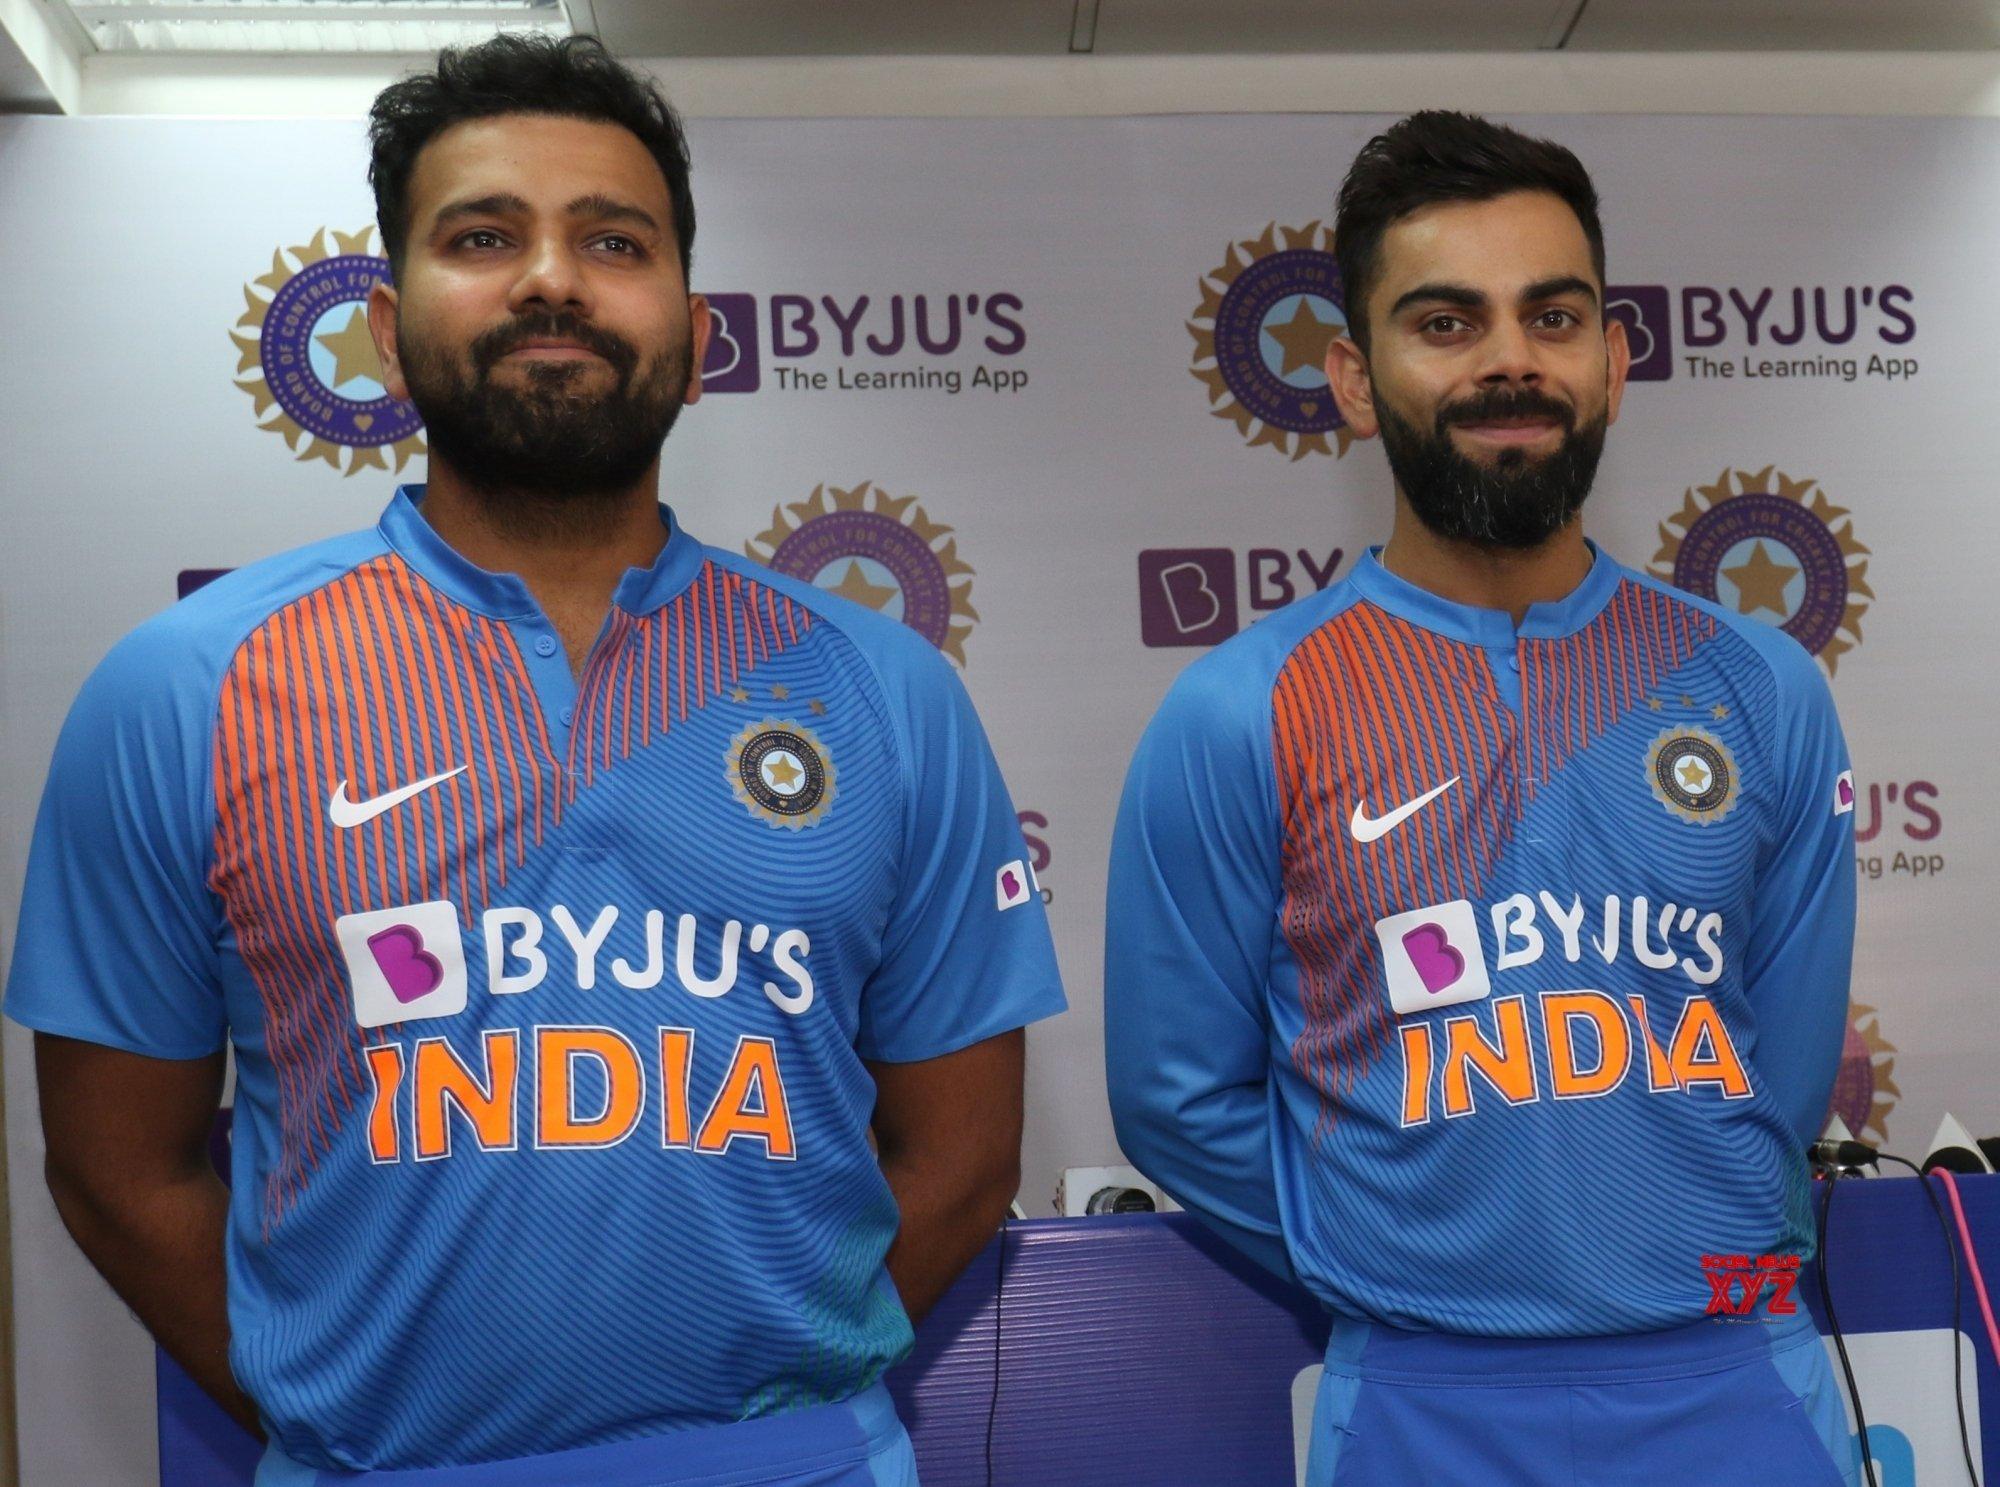 new sponsor logo on indian team jersey